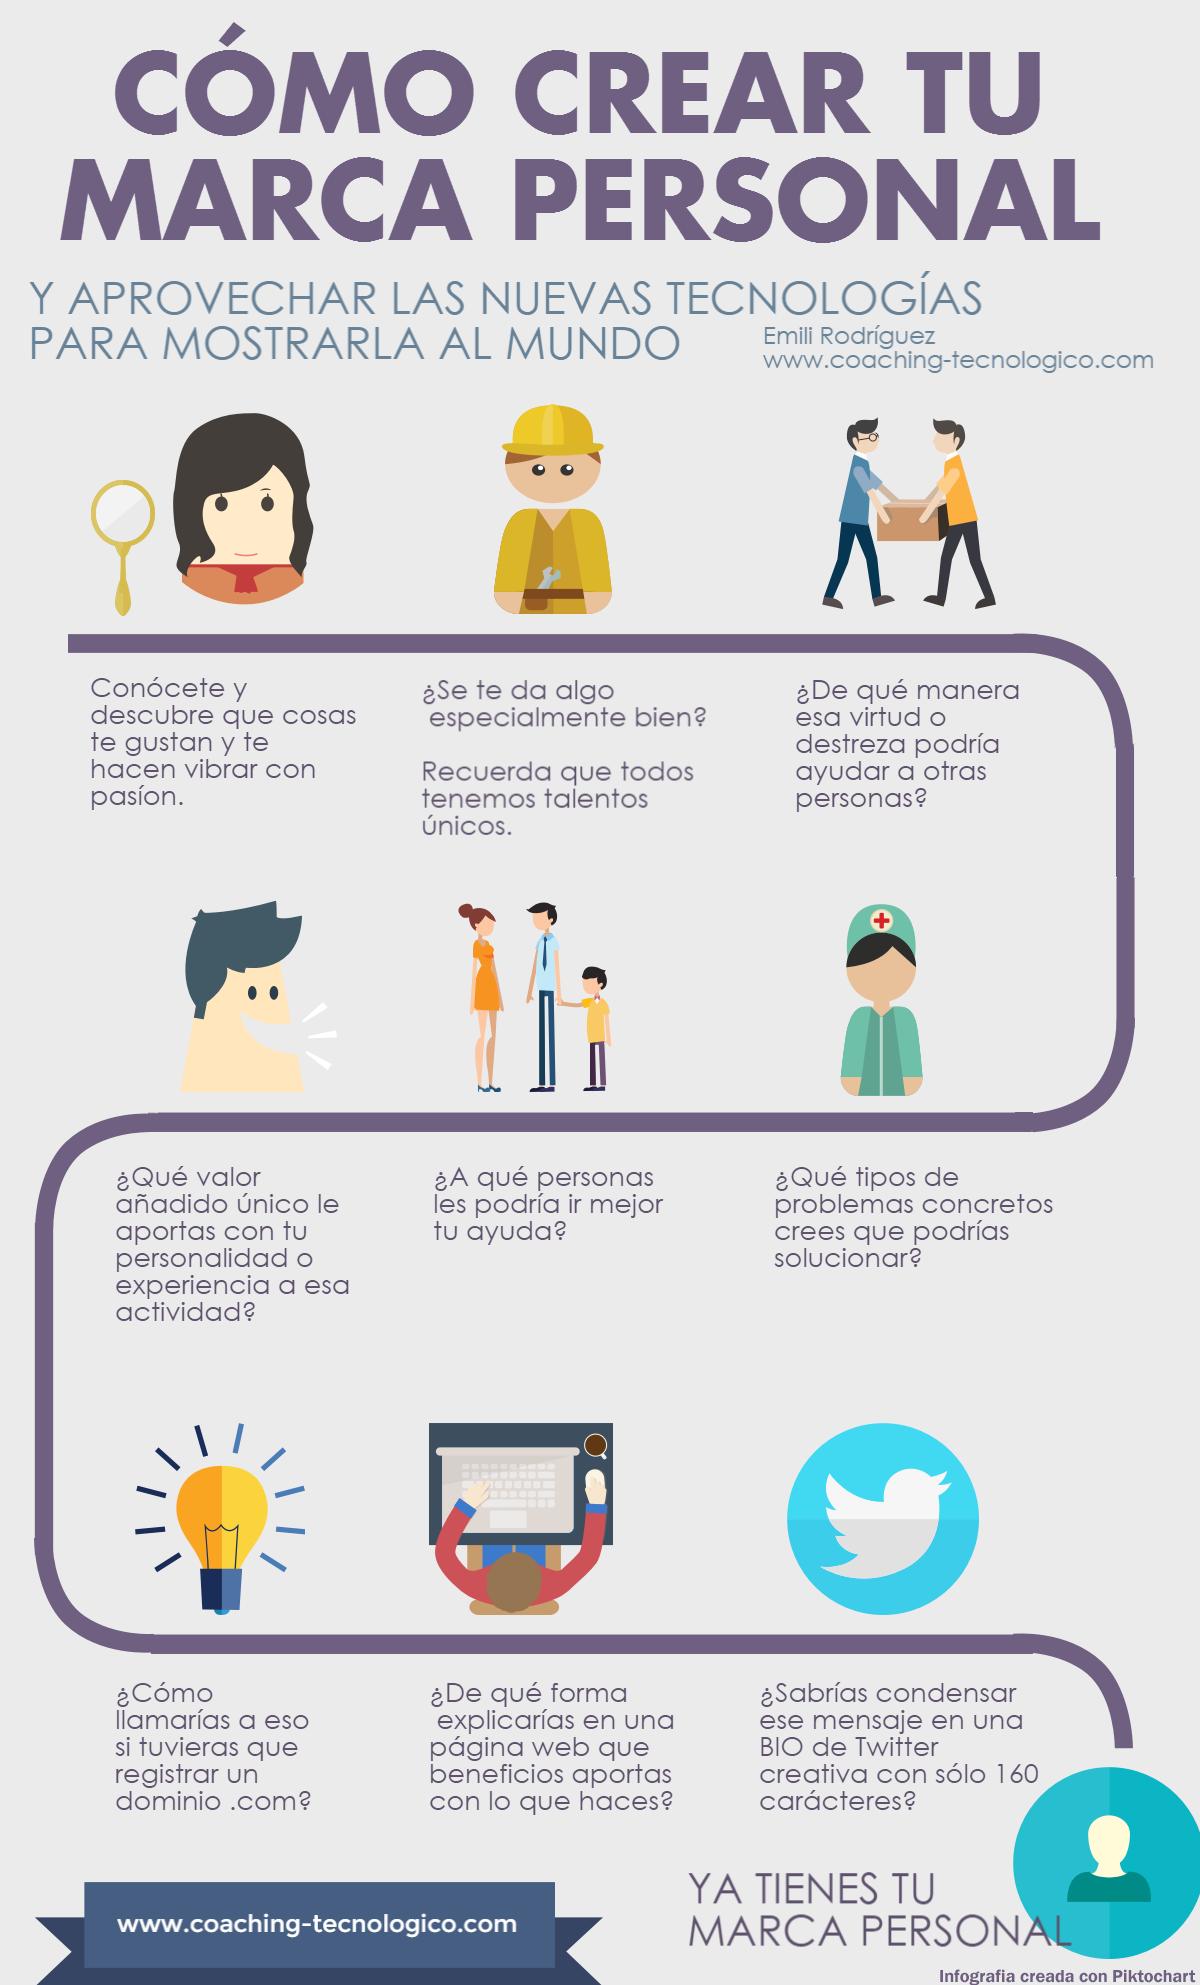 http://www.coaching-tecnologico.com/wp-content/uploads/2015/03/Infografia_Como_Crear_Tu_Marca_Personal.png